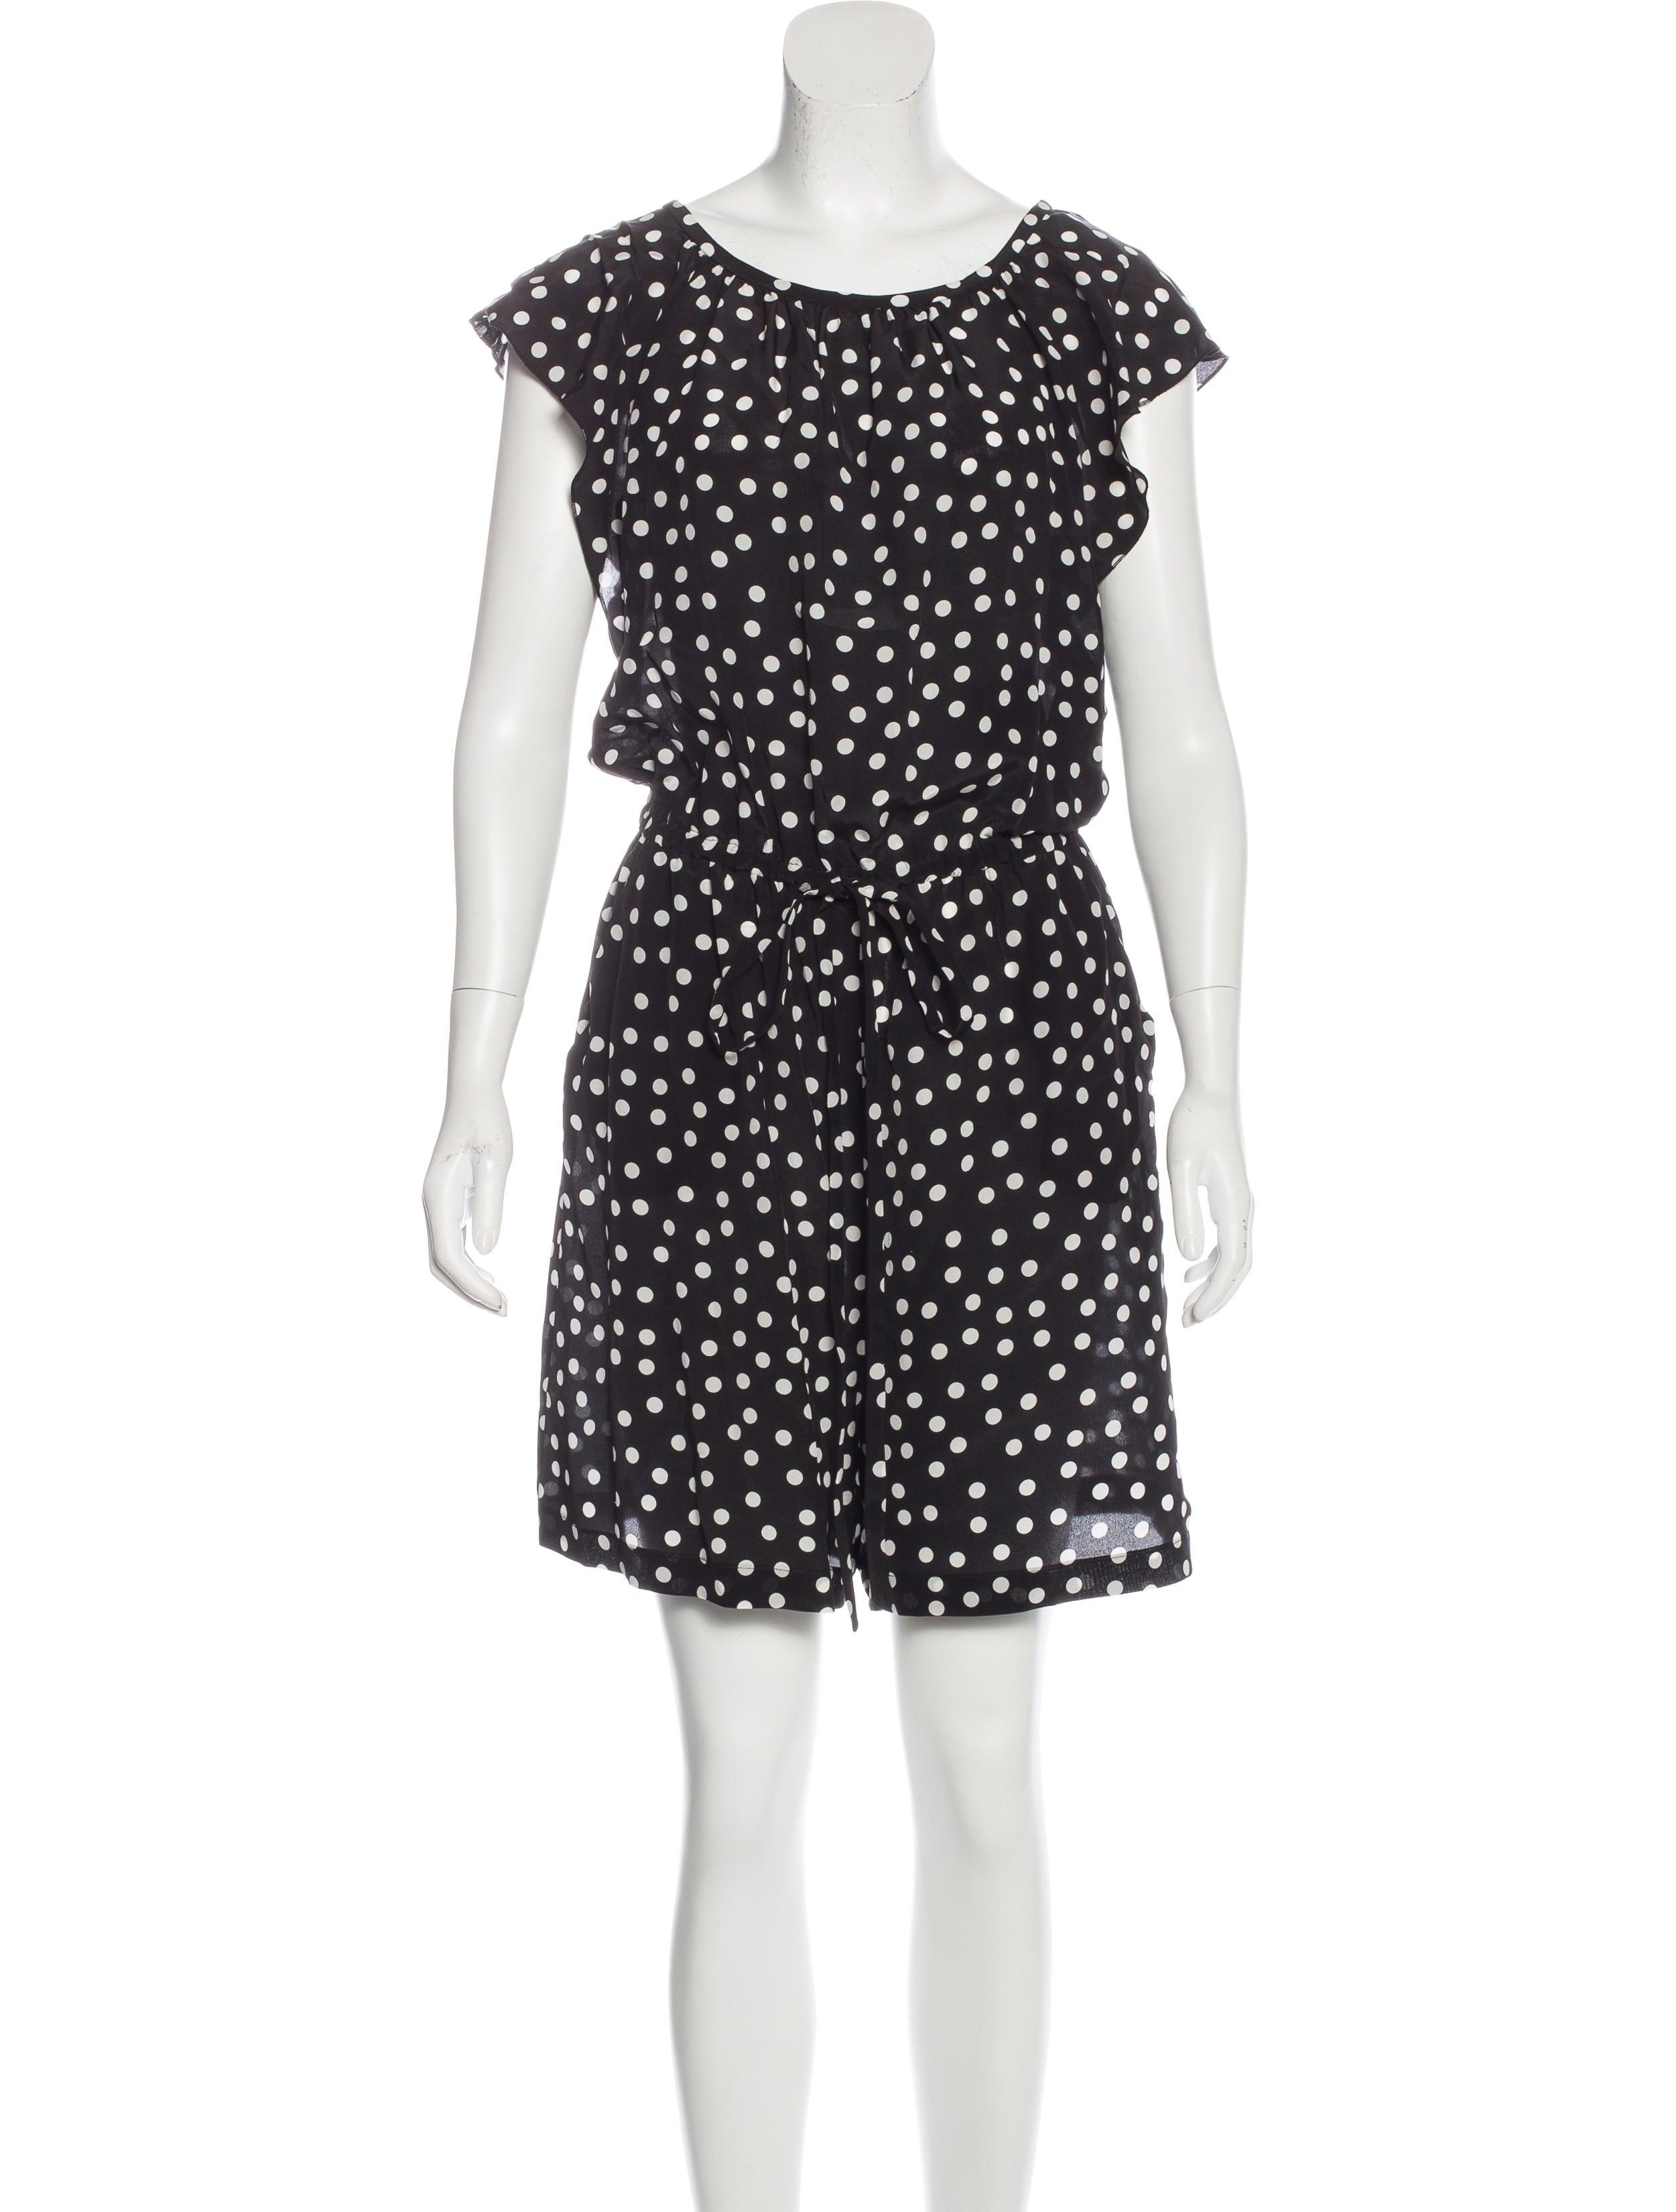 Dolce u0026 Gabbana Polka Dot Printed Romper w/ Tags - Clothing - DAG84116 | The RealReal